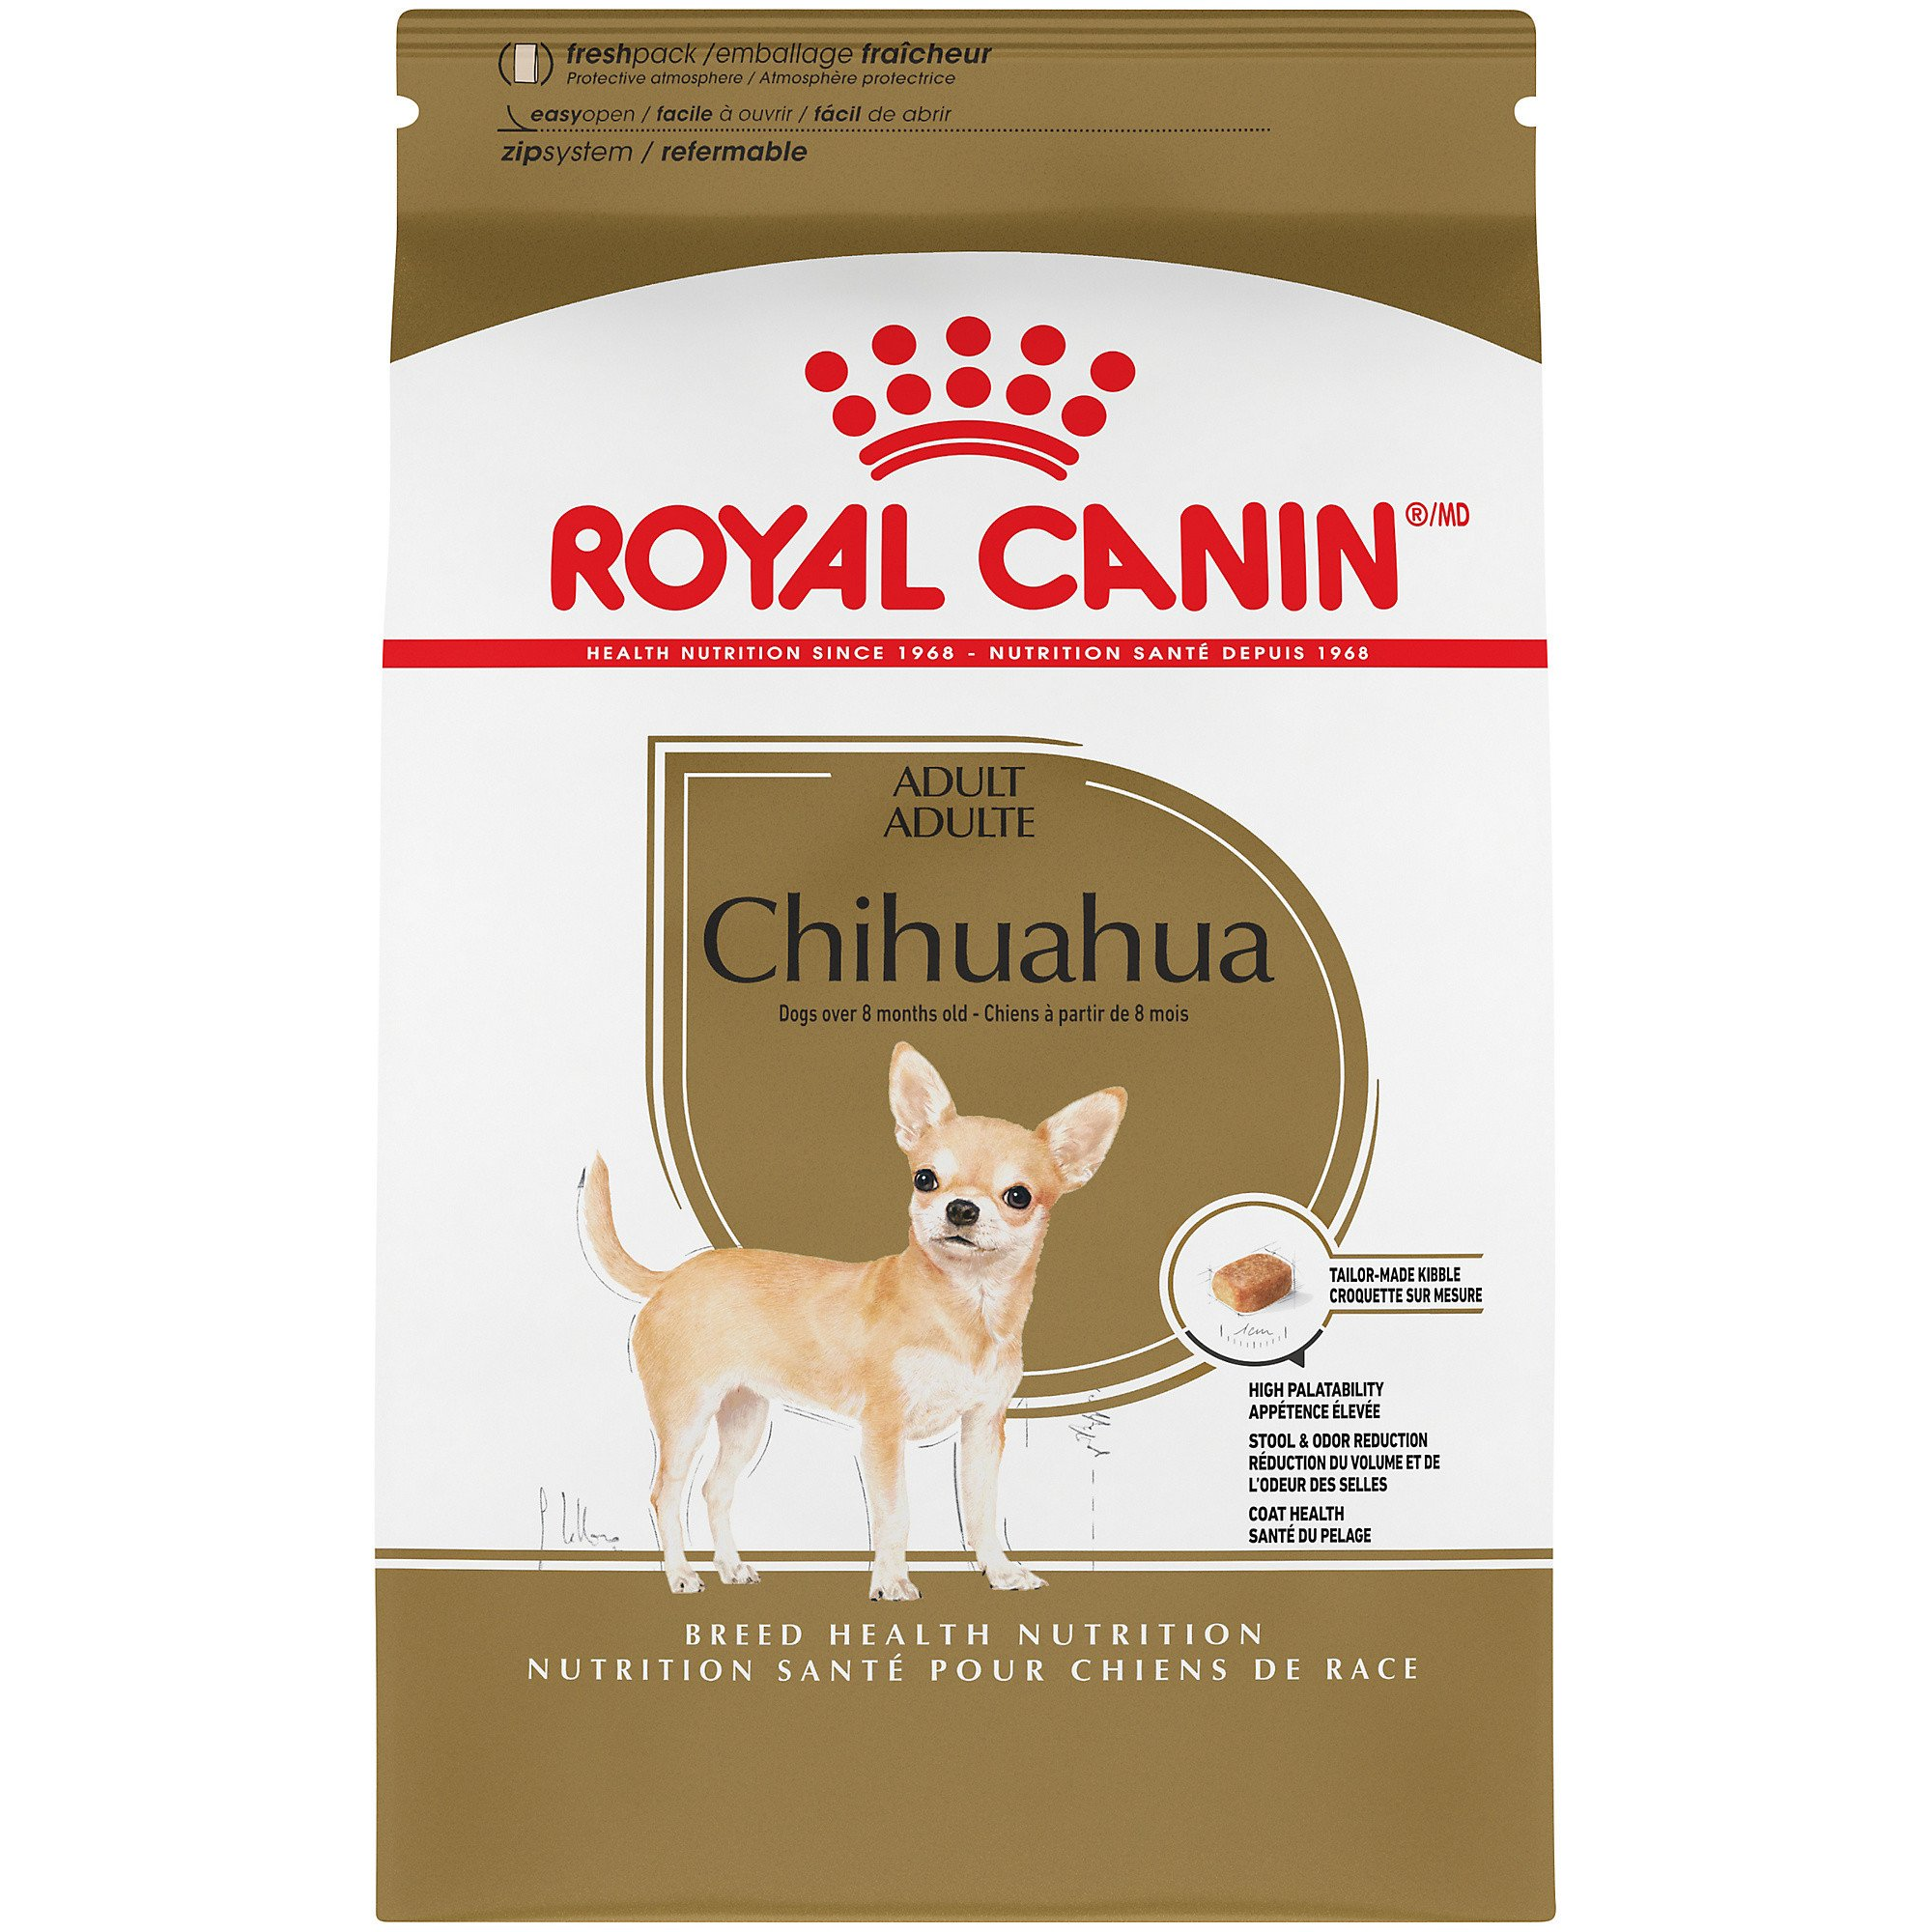 Royal Canin Small Breed Dog Food